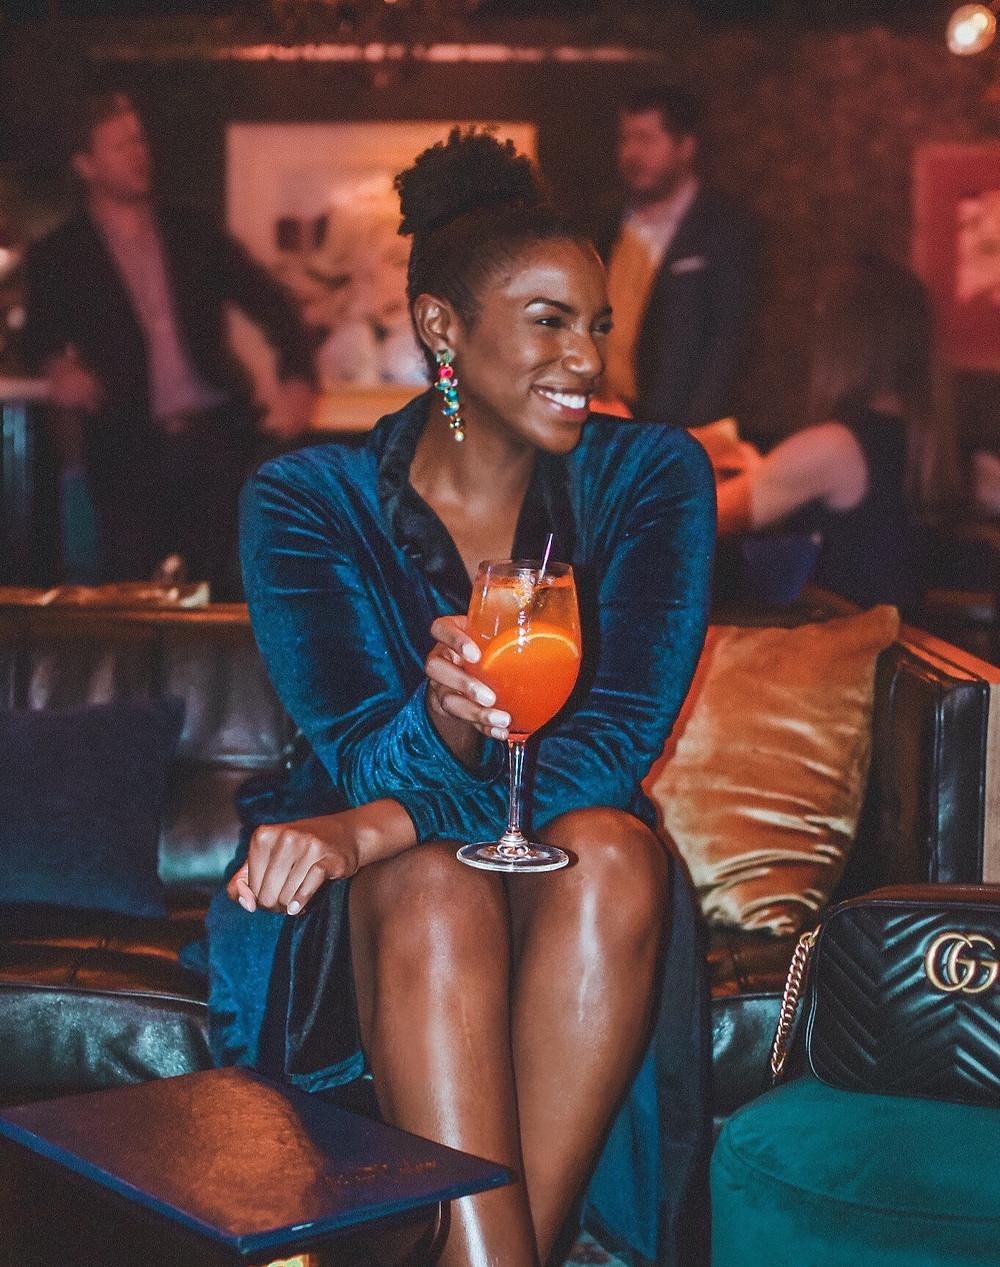 Felix Culpa 0 10 Romantic Vegan-Friendly Restaurants in Dallas for Date Night